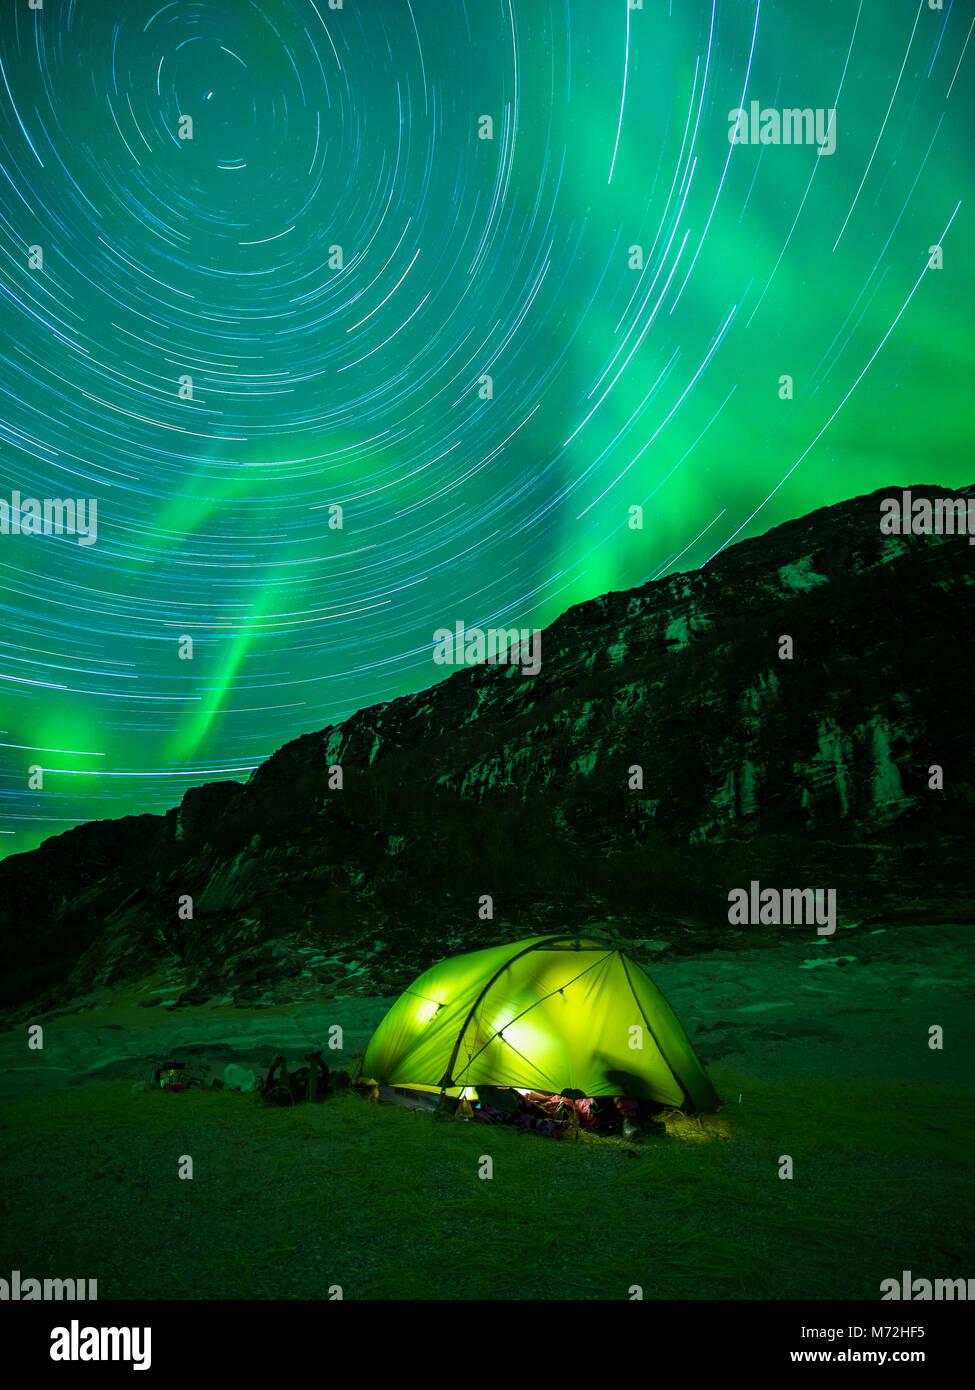 Sleeping under spinning stars - Stock Image